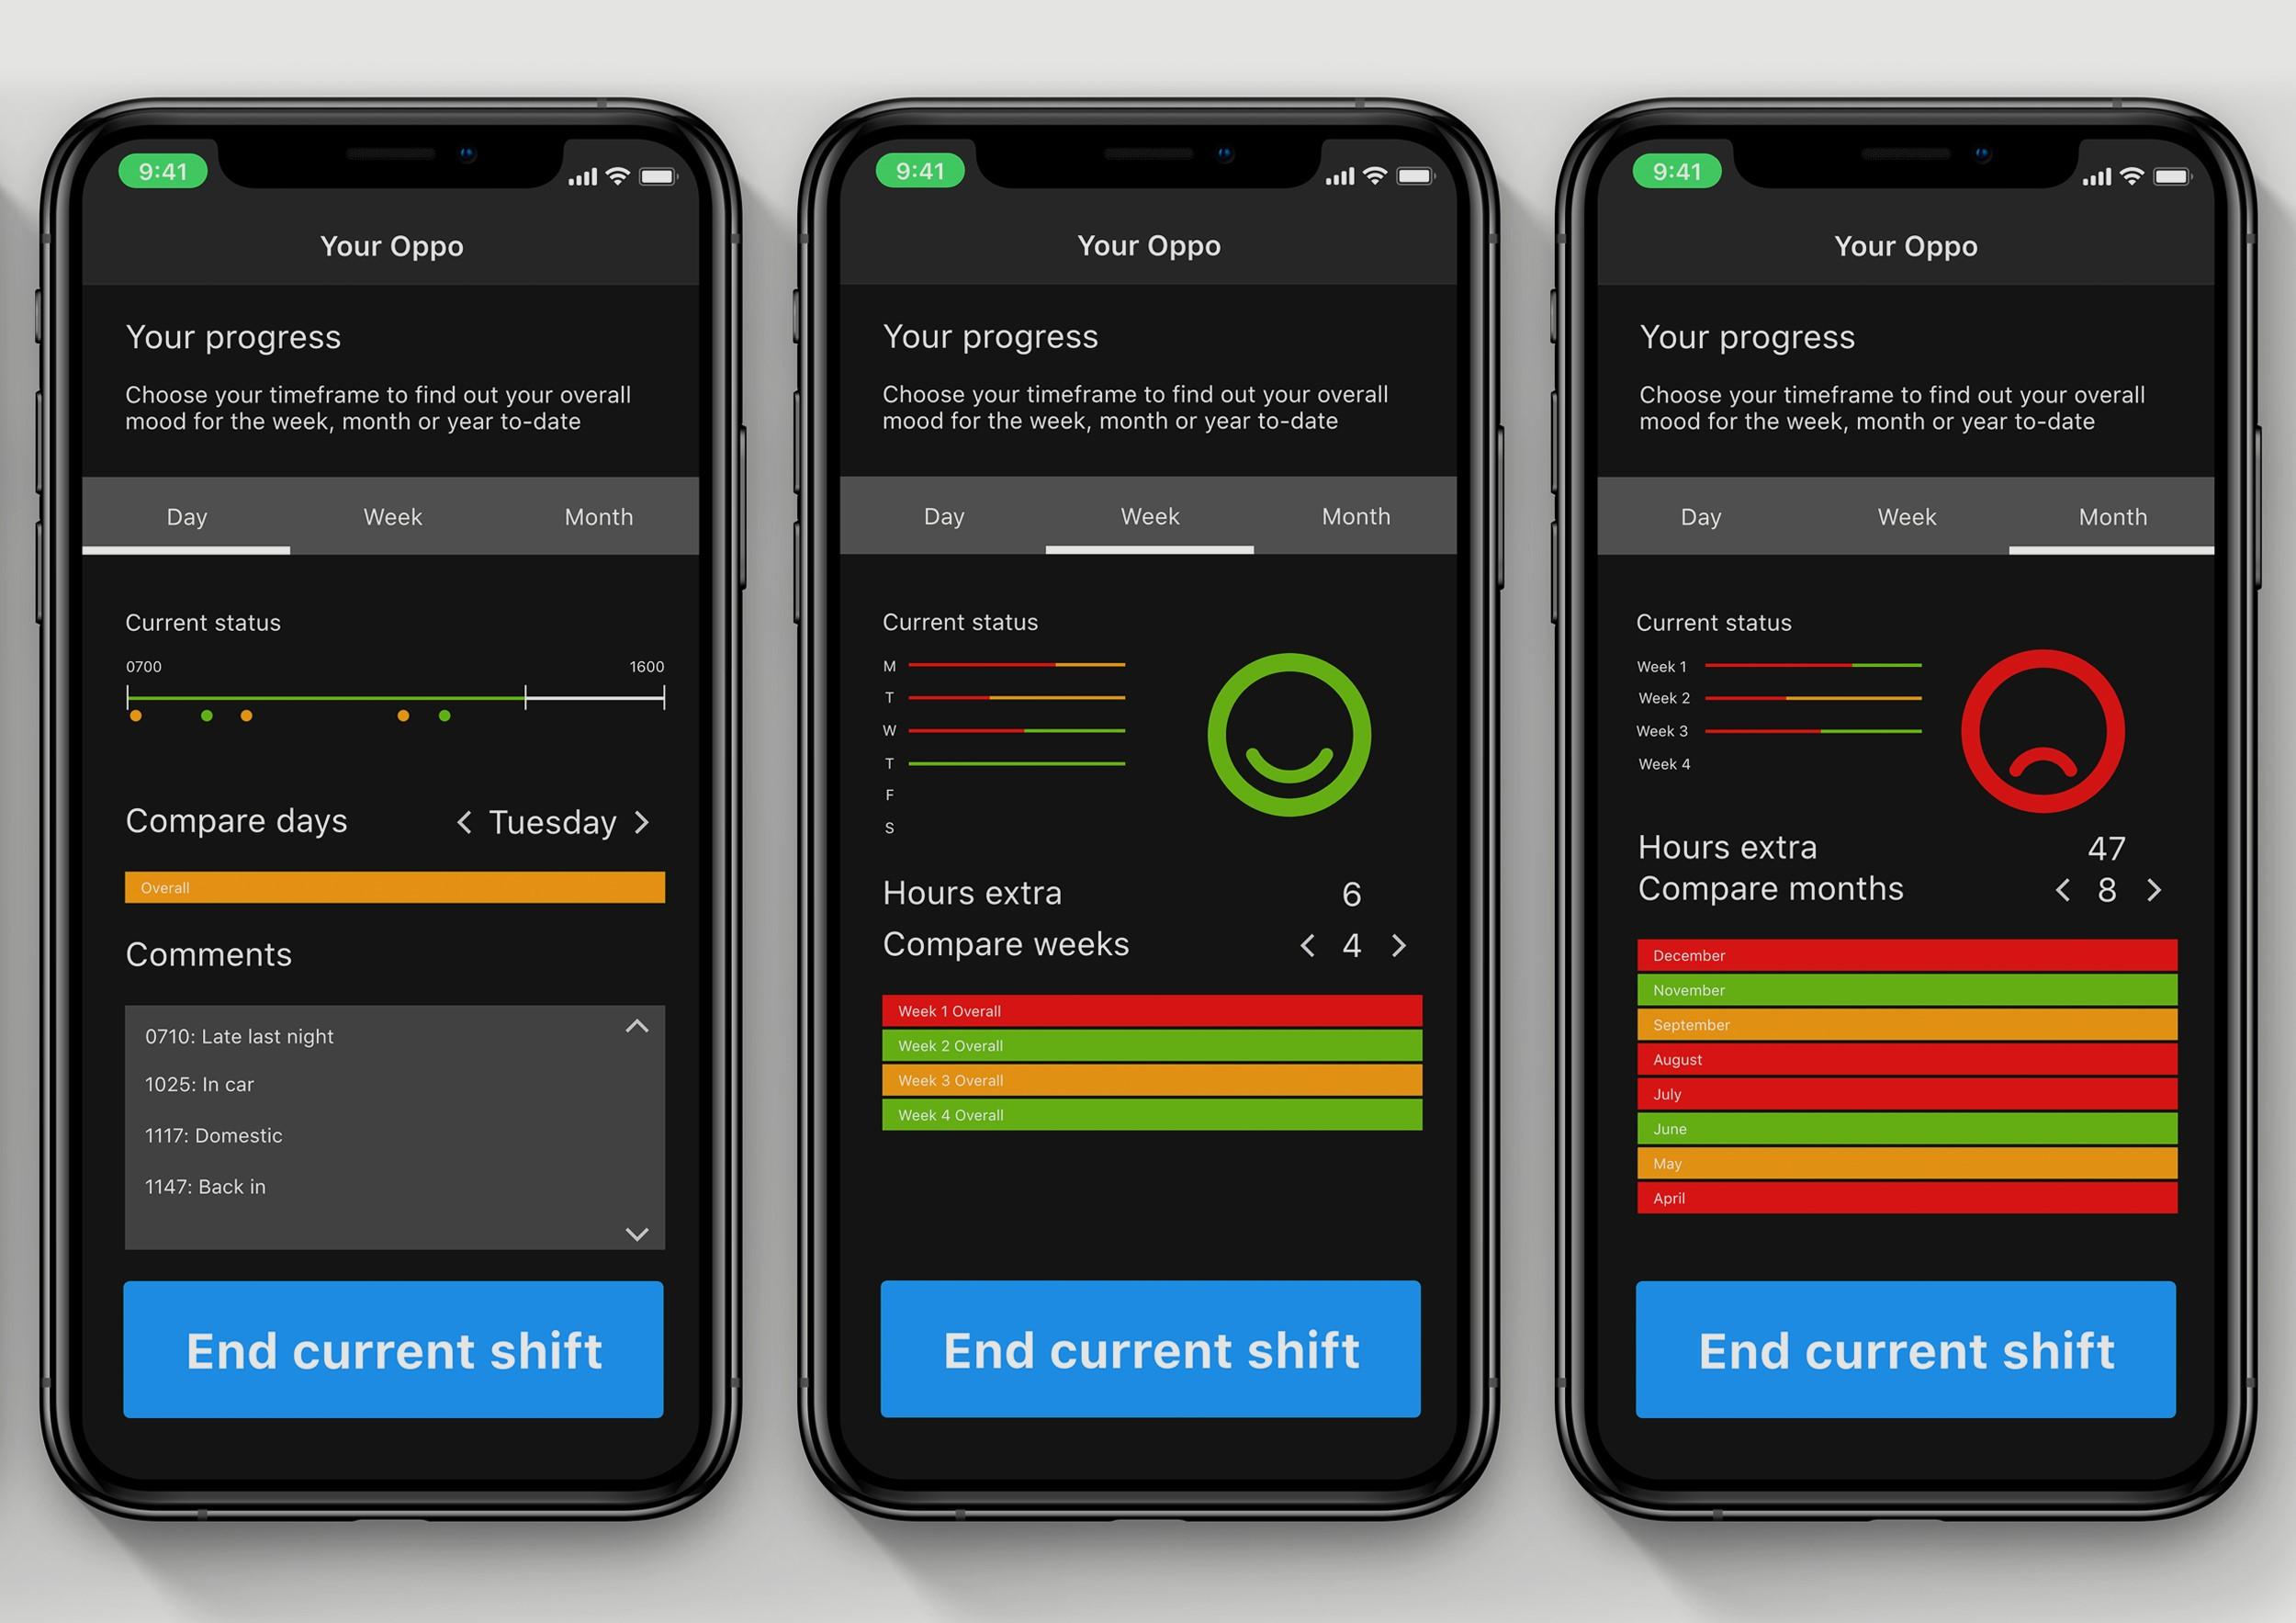 Oppo app interface